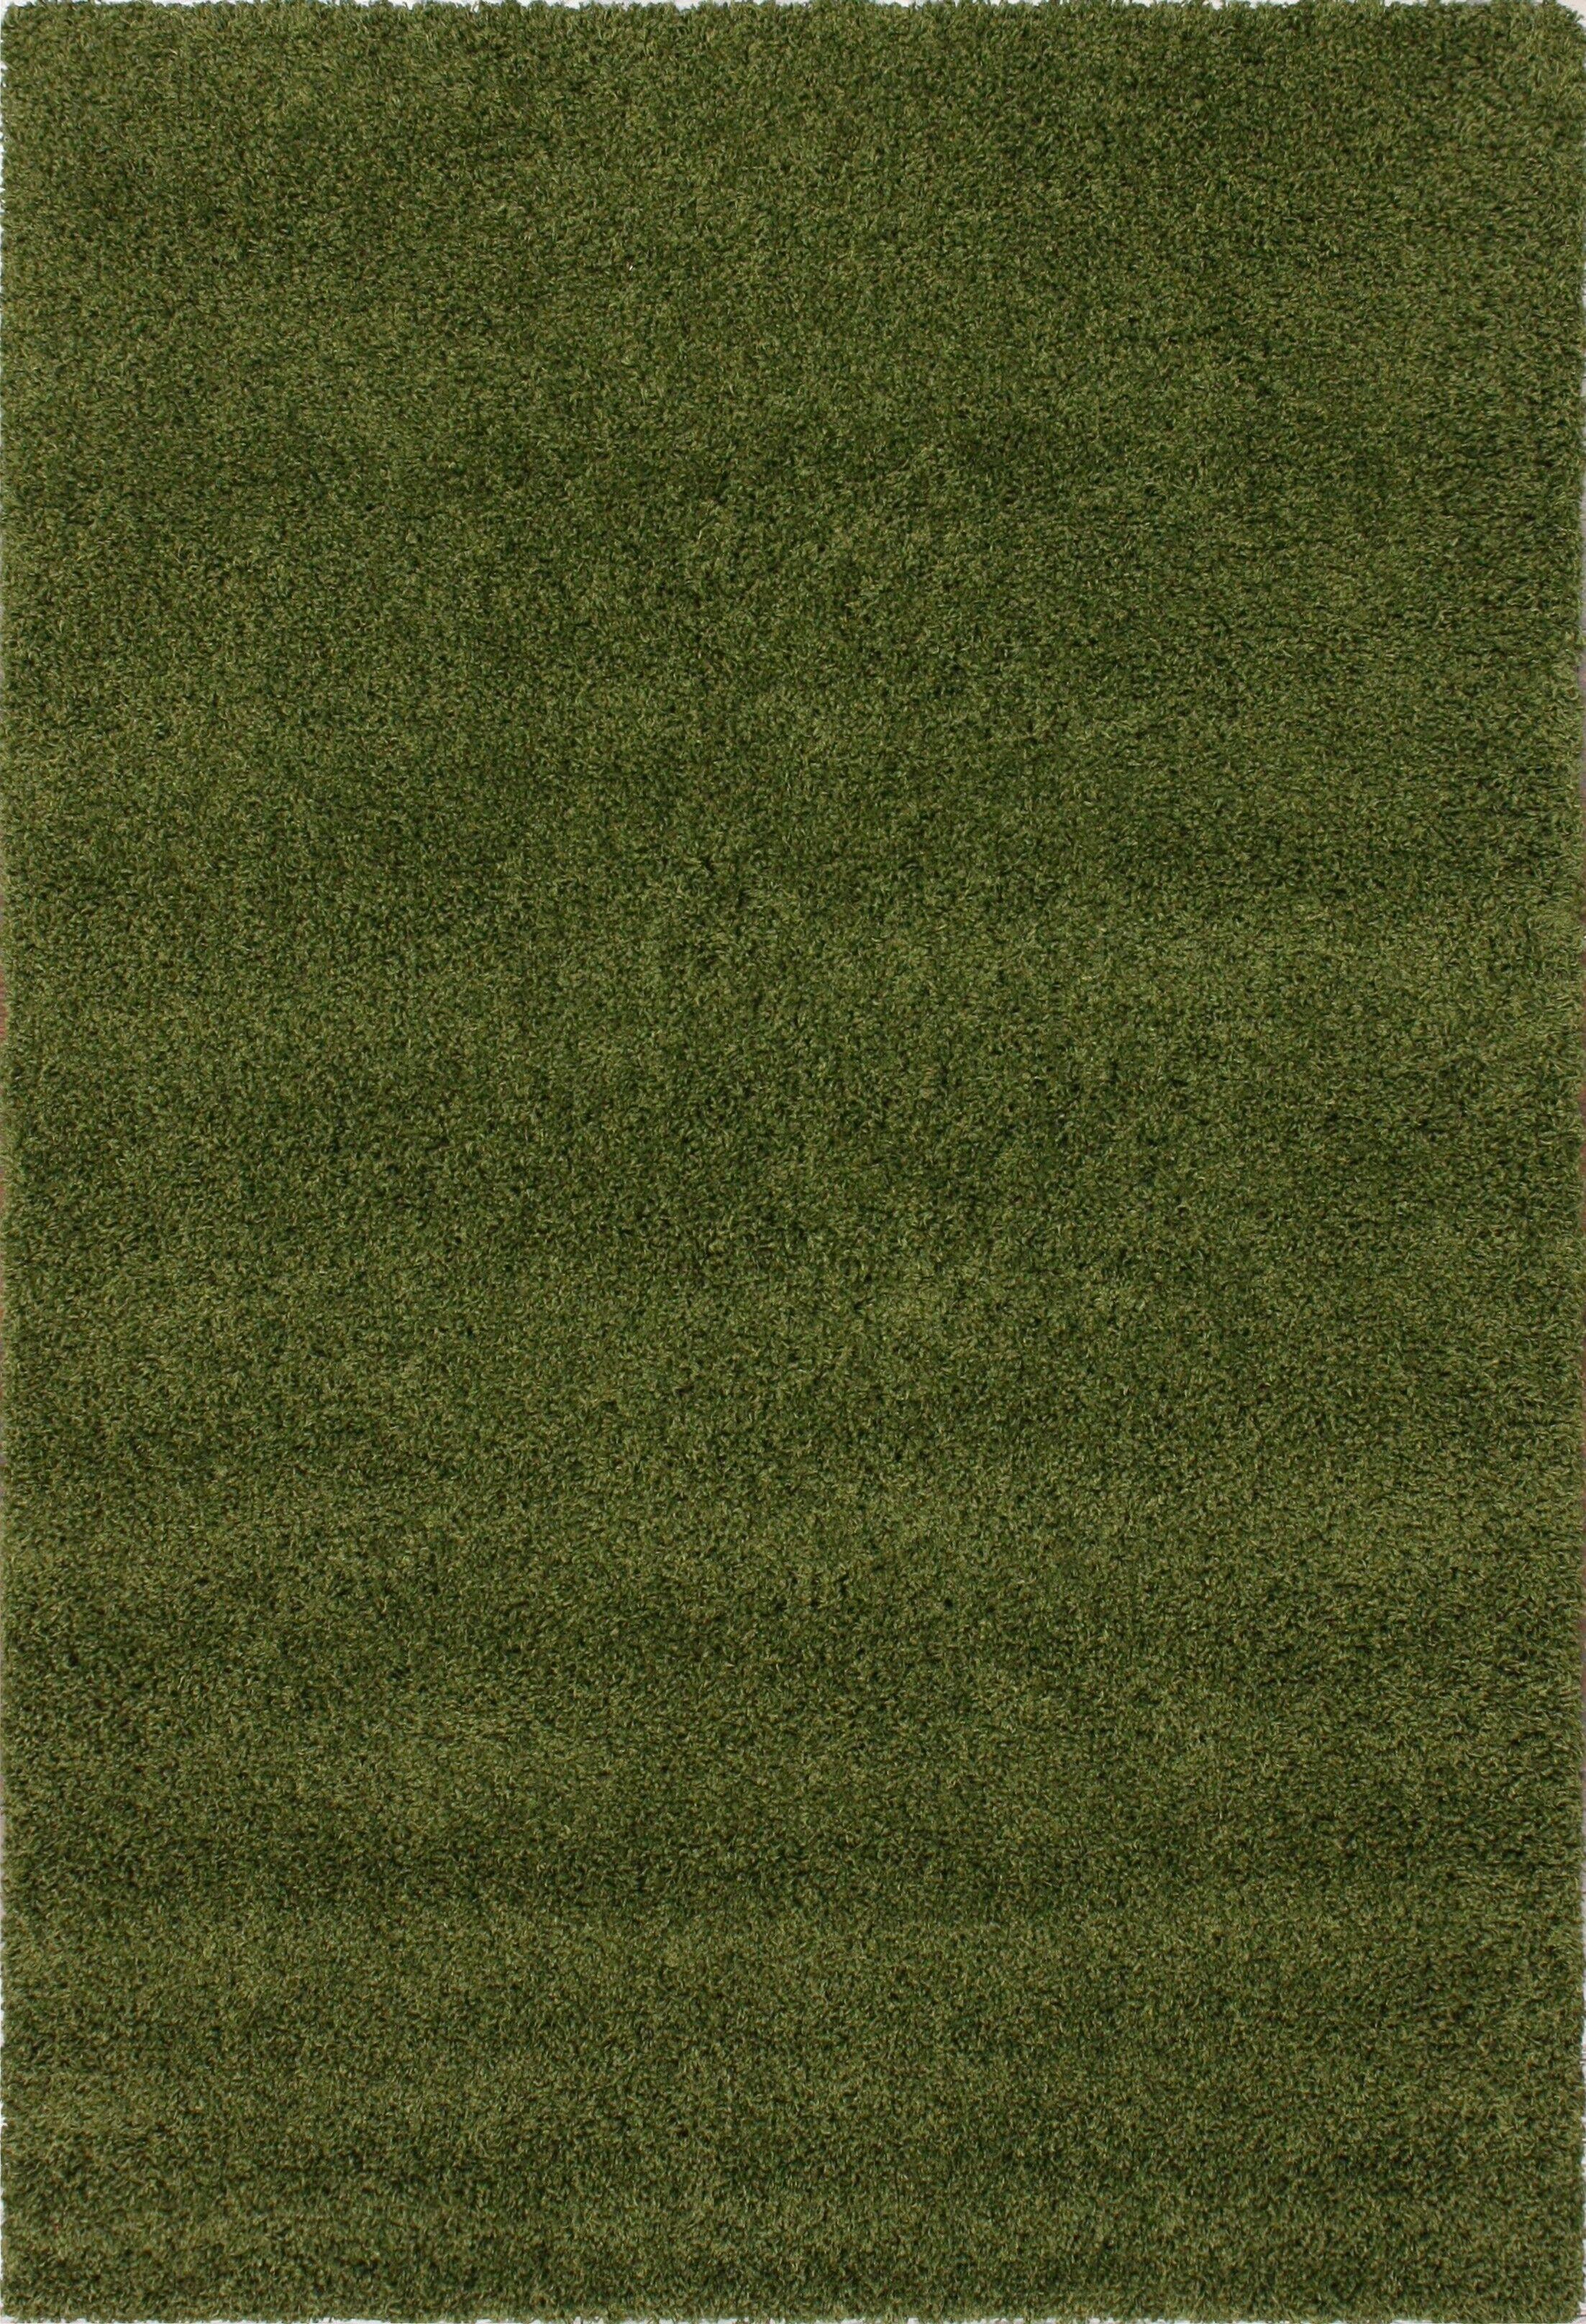 Veneti Hunter Green Area Rug Rug Size: Rectangle 5'3